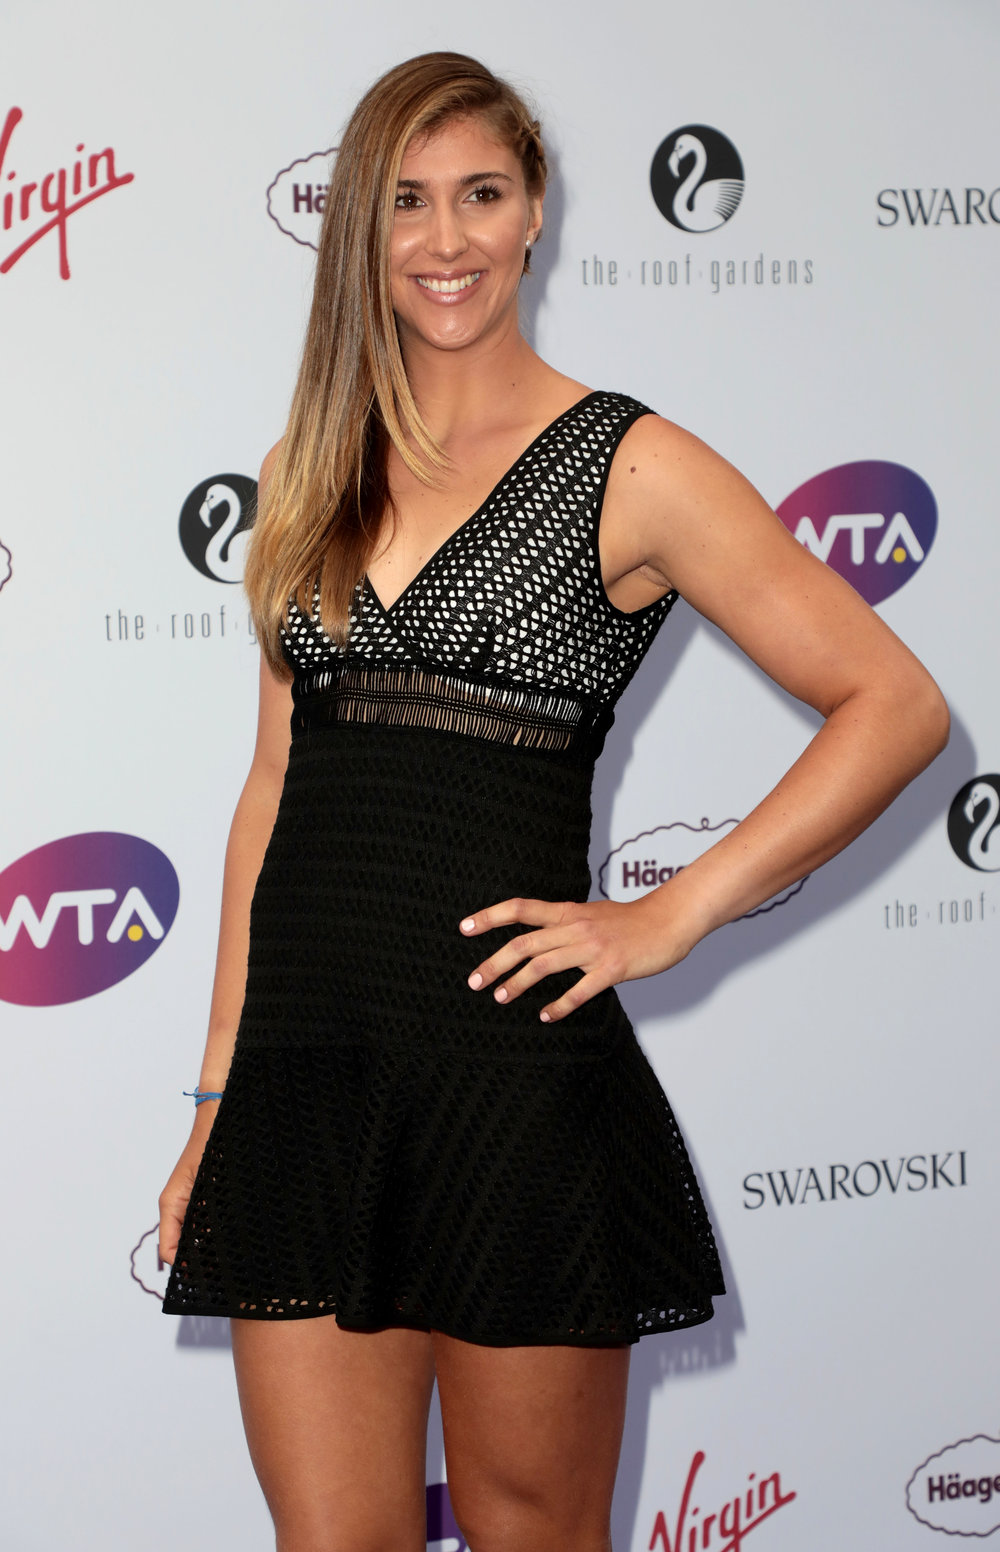 PHT_B5327_WTA_Pre_Wimbledon_Party_13781.JPG